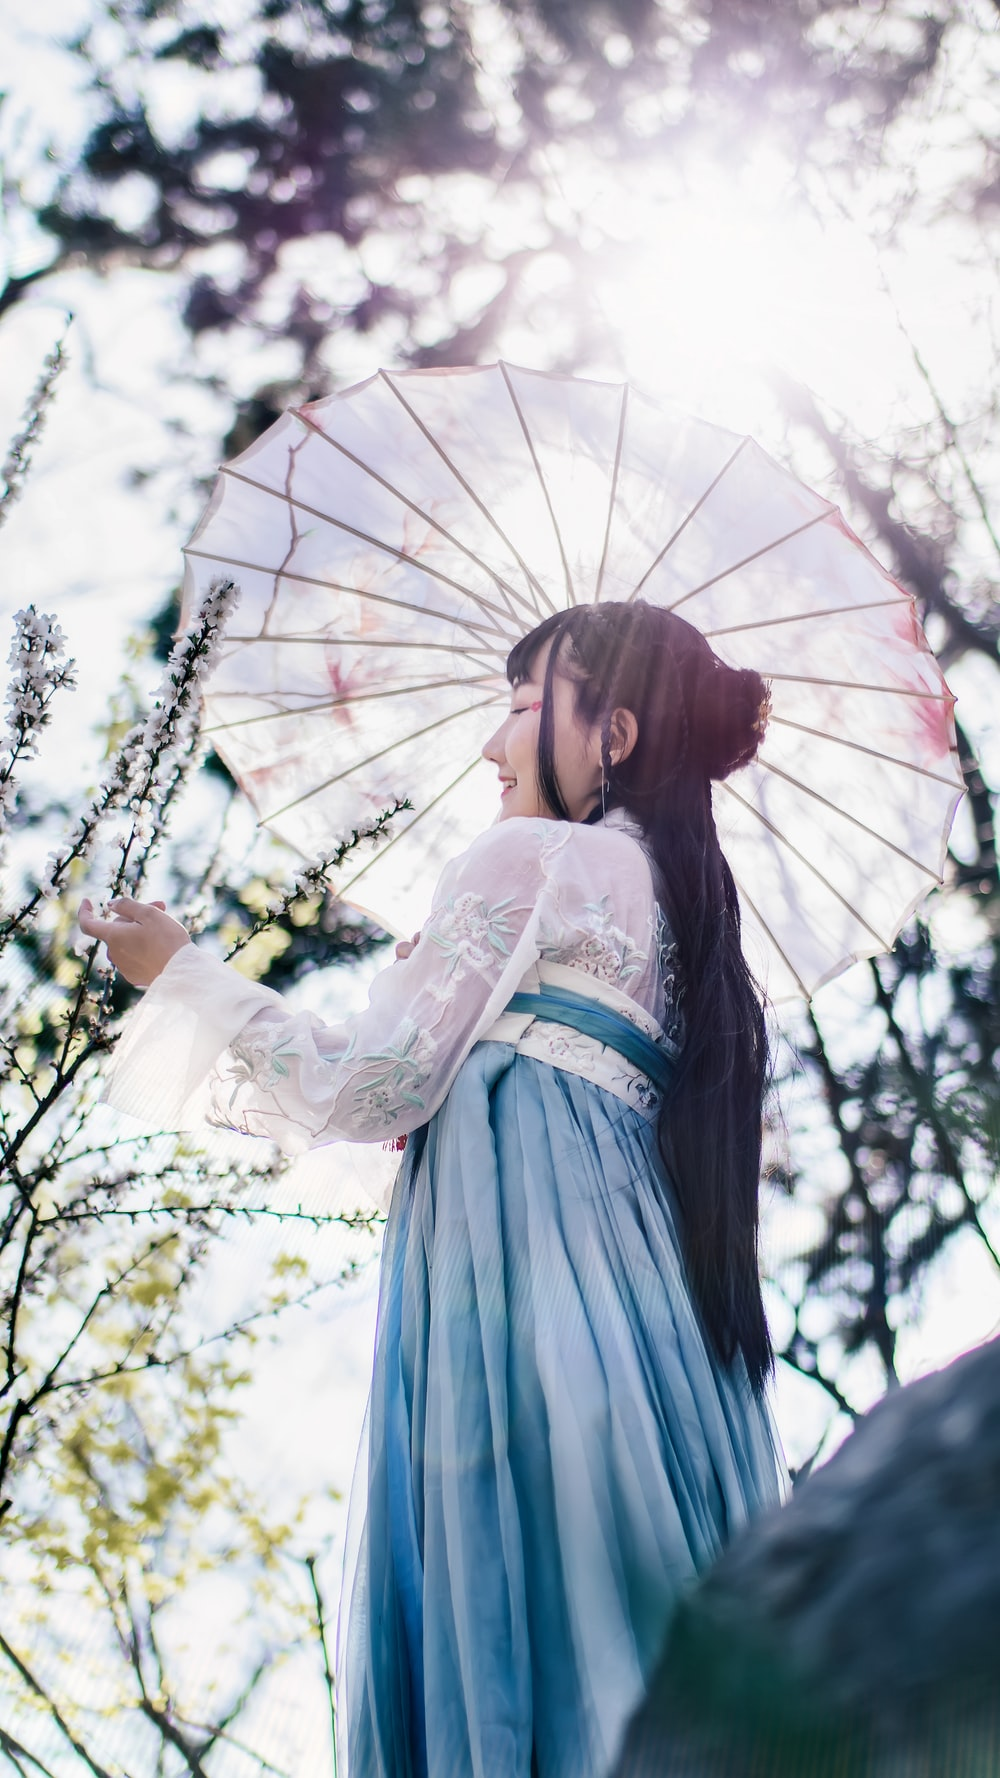 woman in kimono holding umbrella